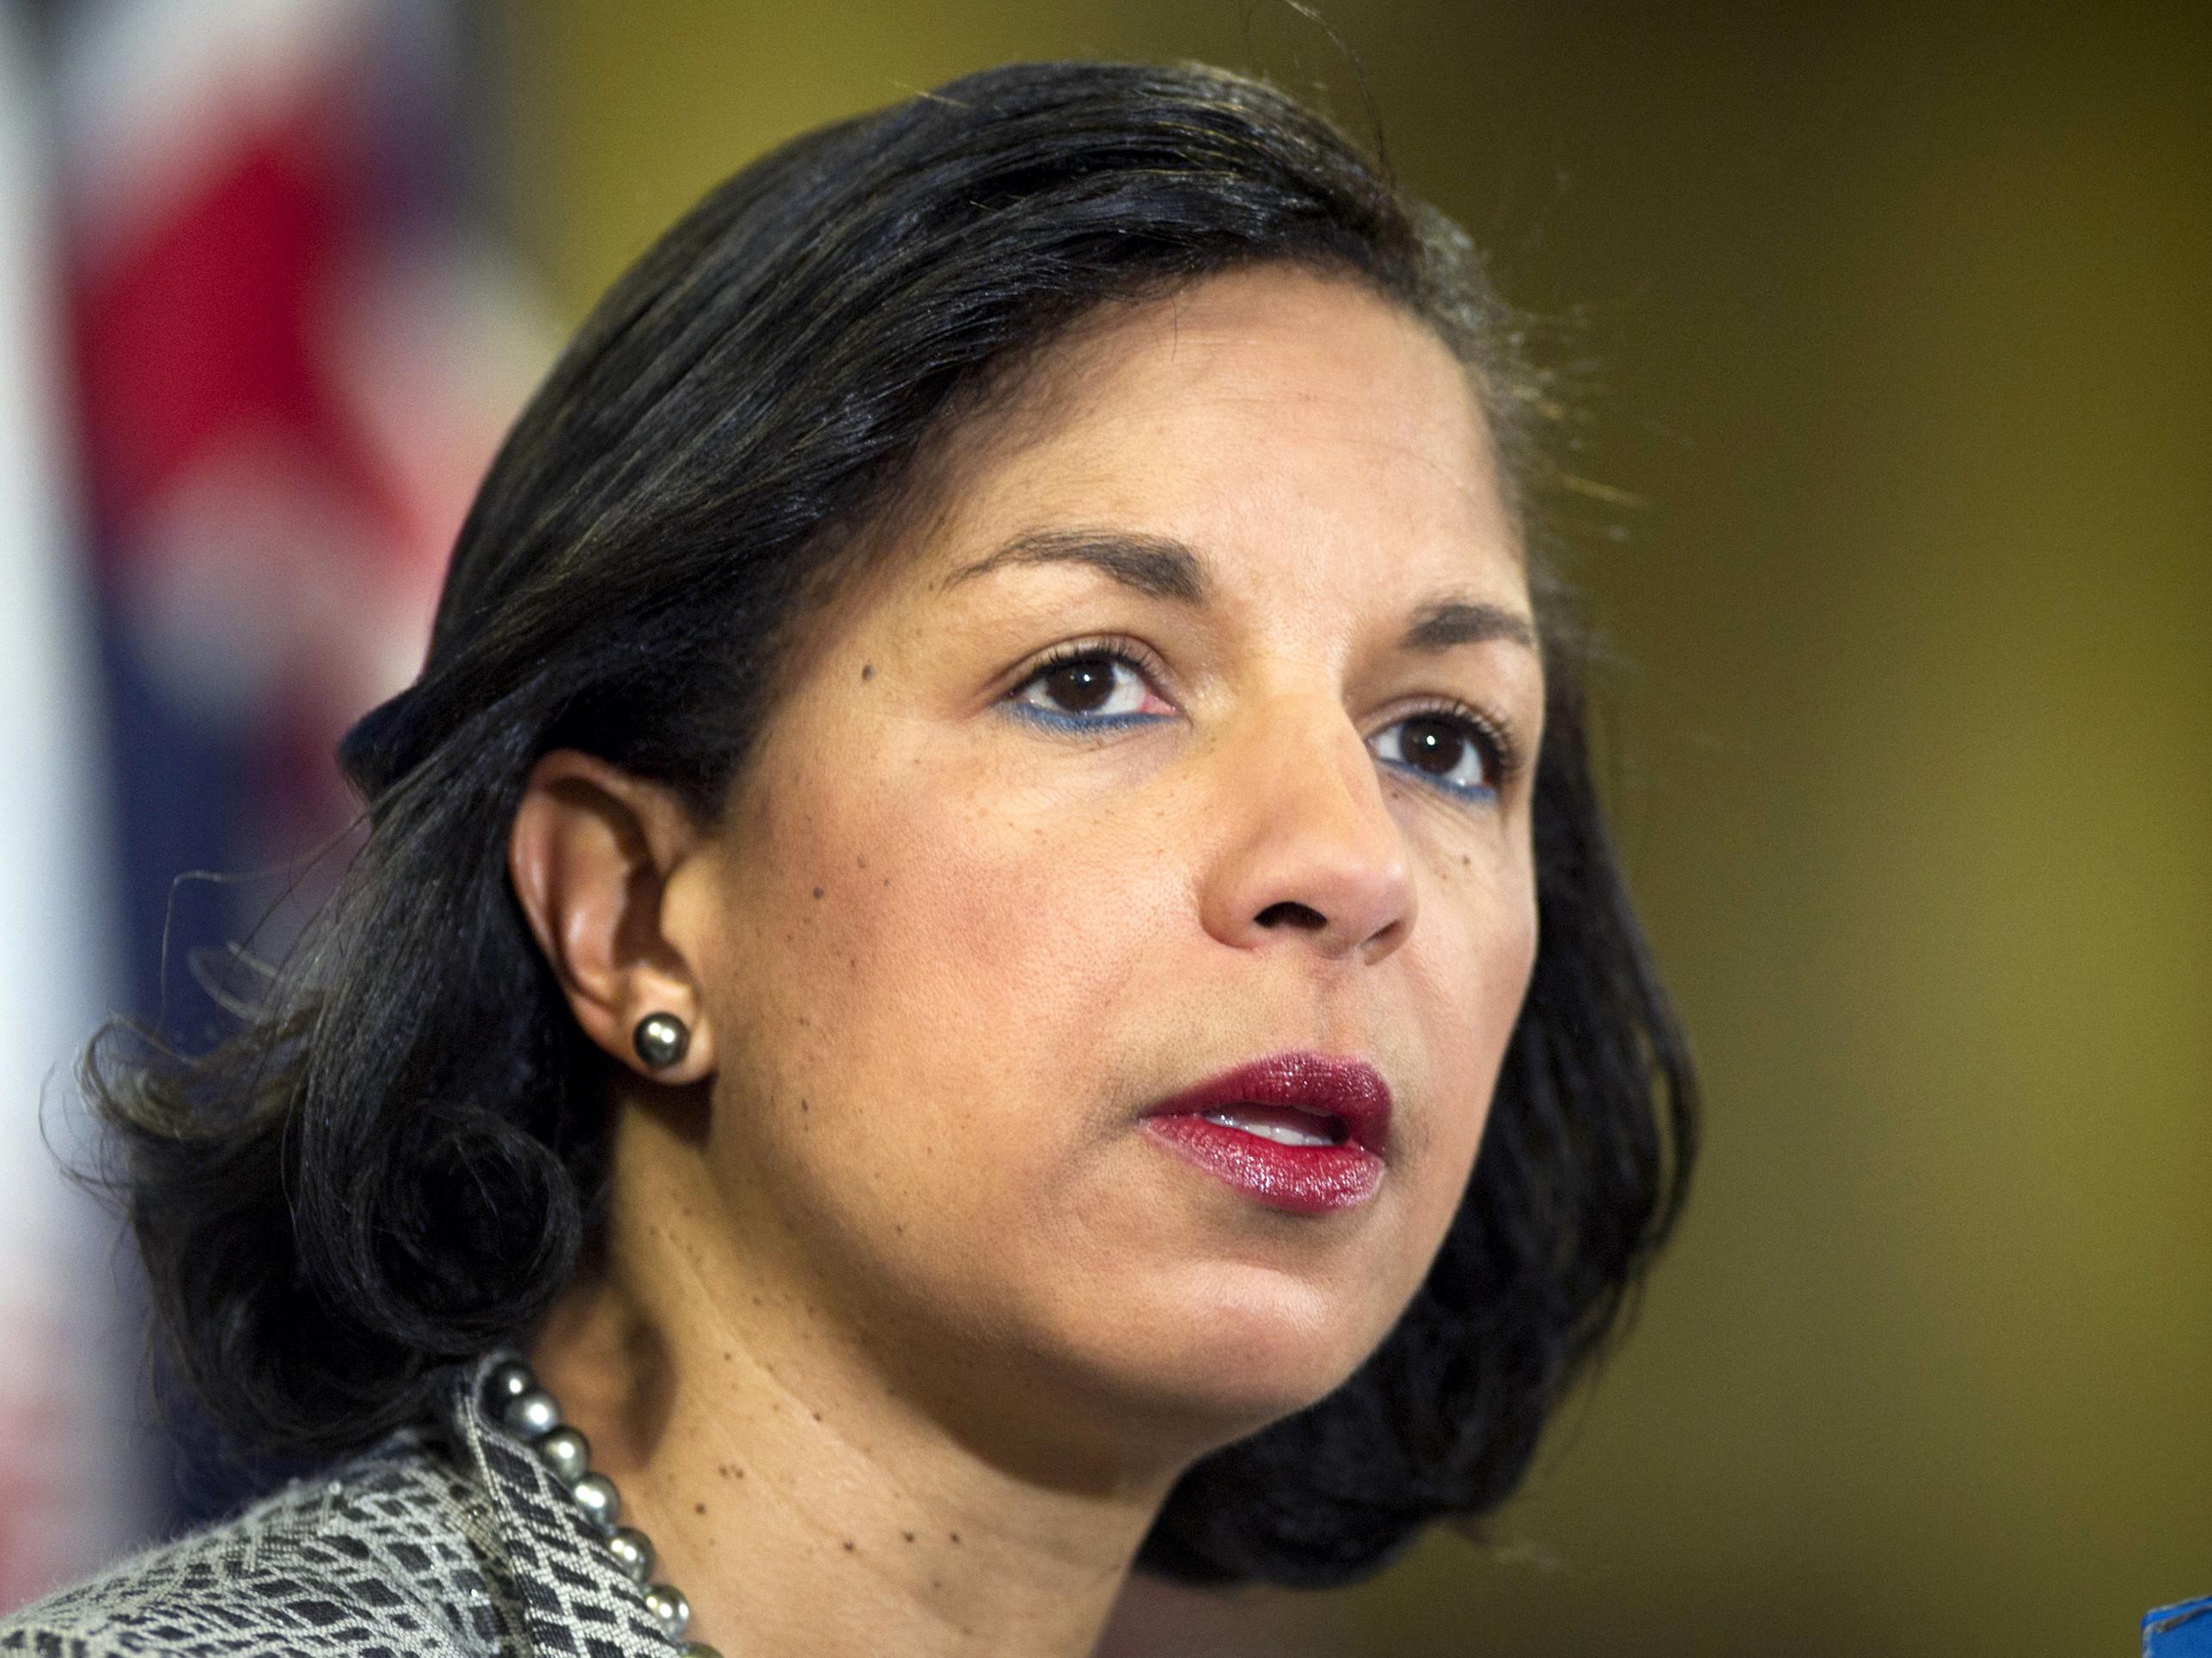 Shakeup: Susan Rice To Be Obama's National Security Adviser